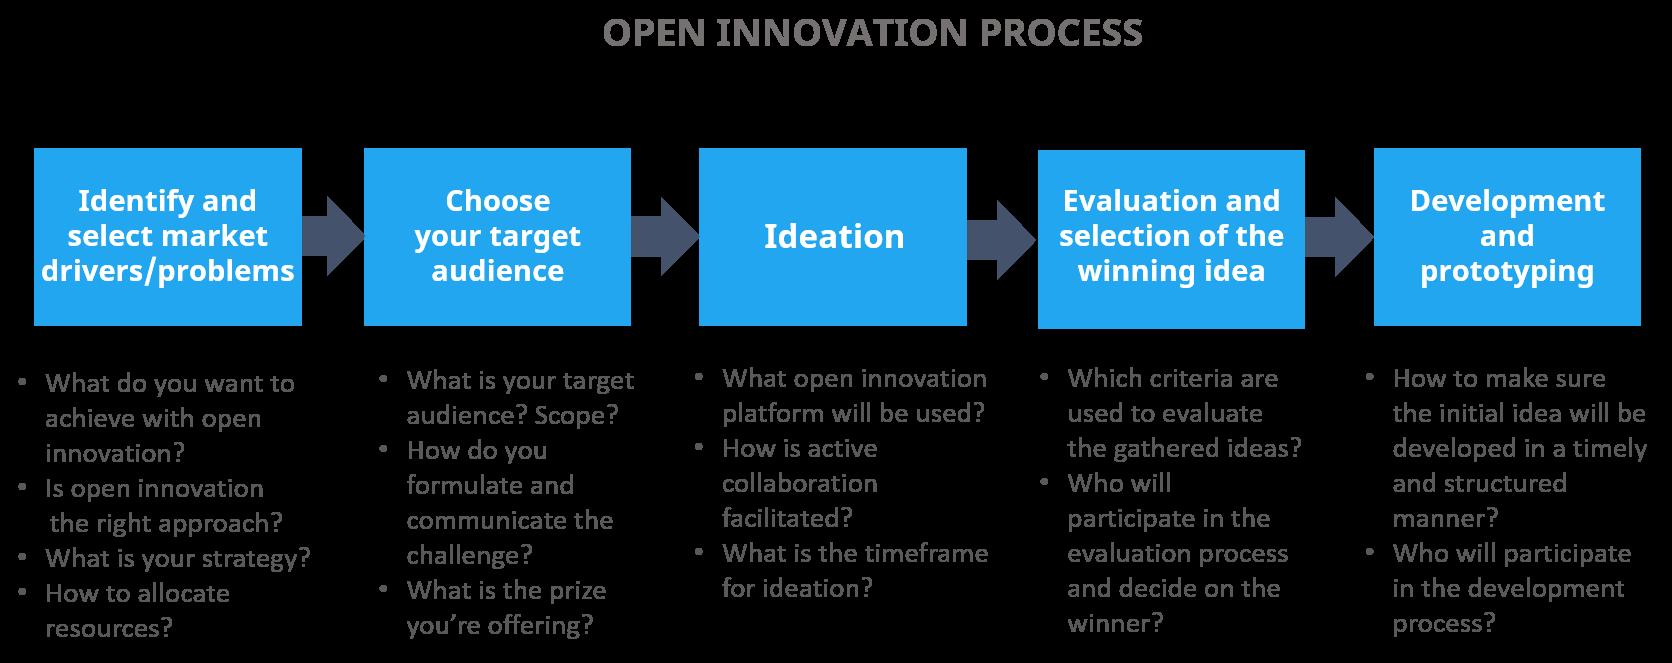 Open innovation process